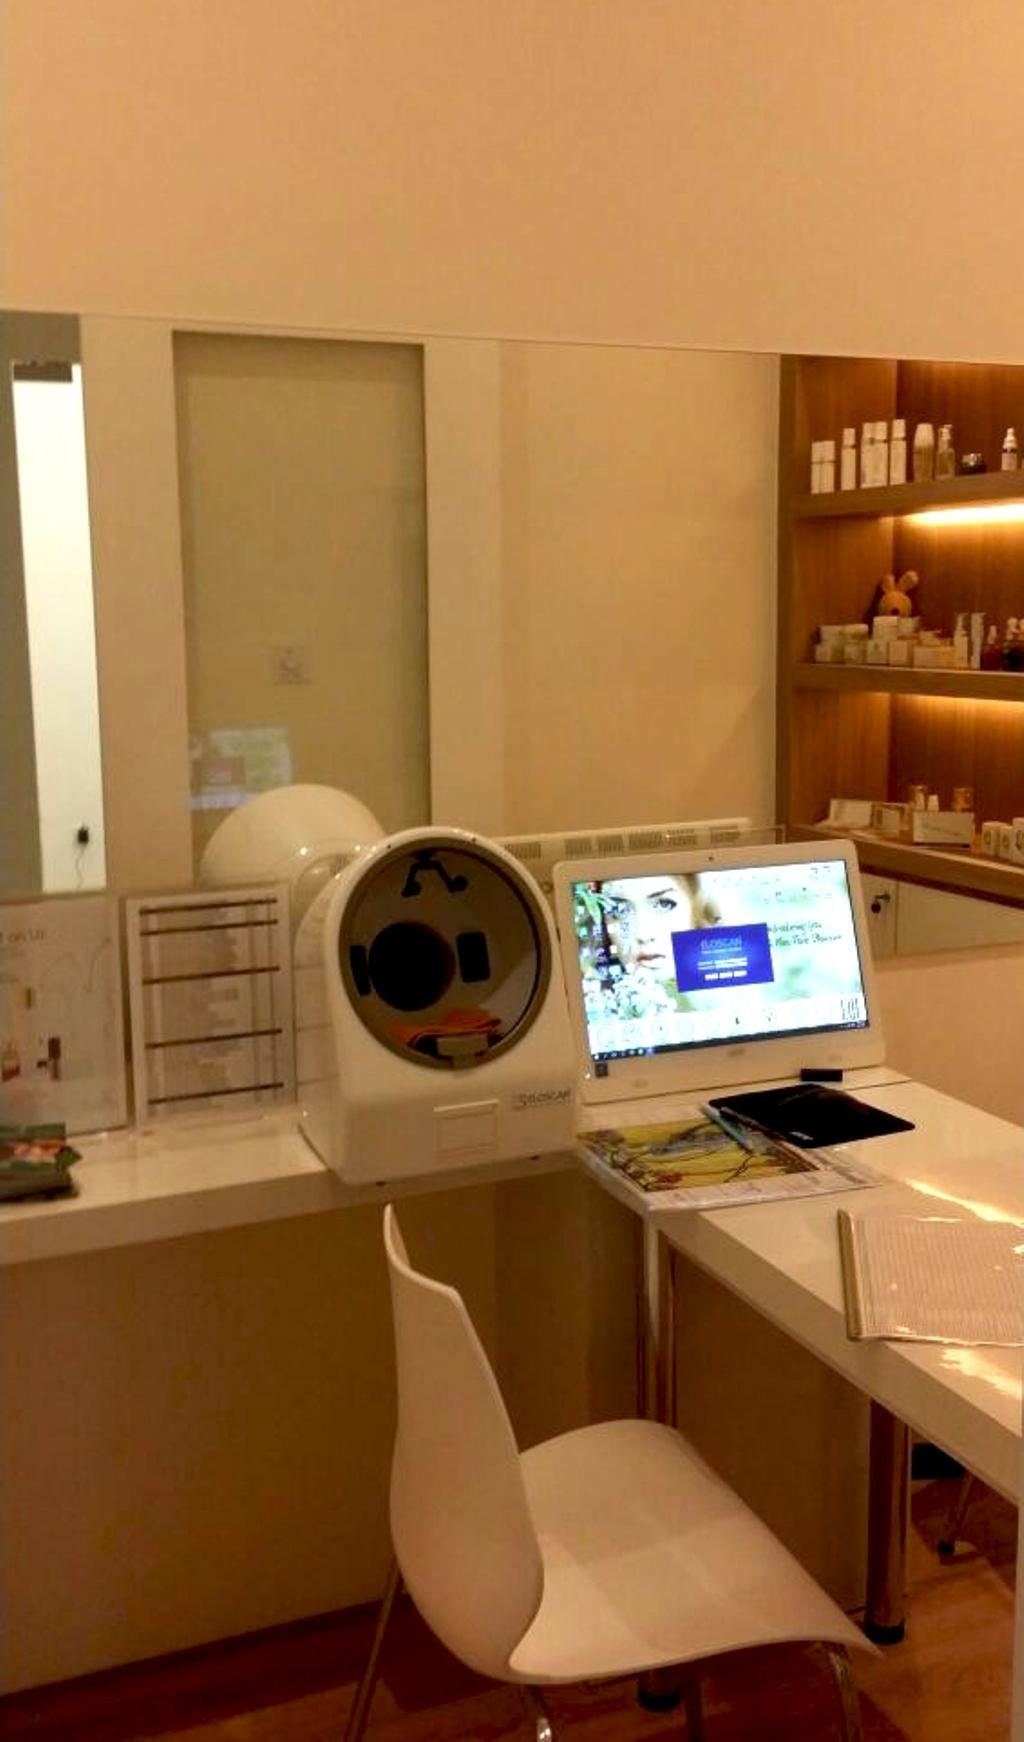 Revival Skin Lab Medical Spa, Sarawak, Commercial, Interior Designer, TOD Interior Design, Minimalistic, Modern, Appliance, Electrical Device, Oven